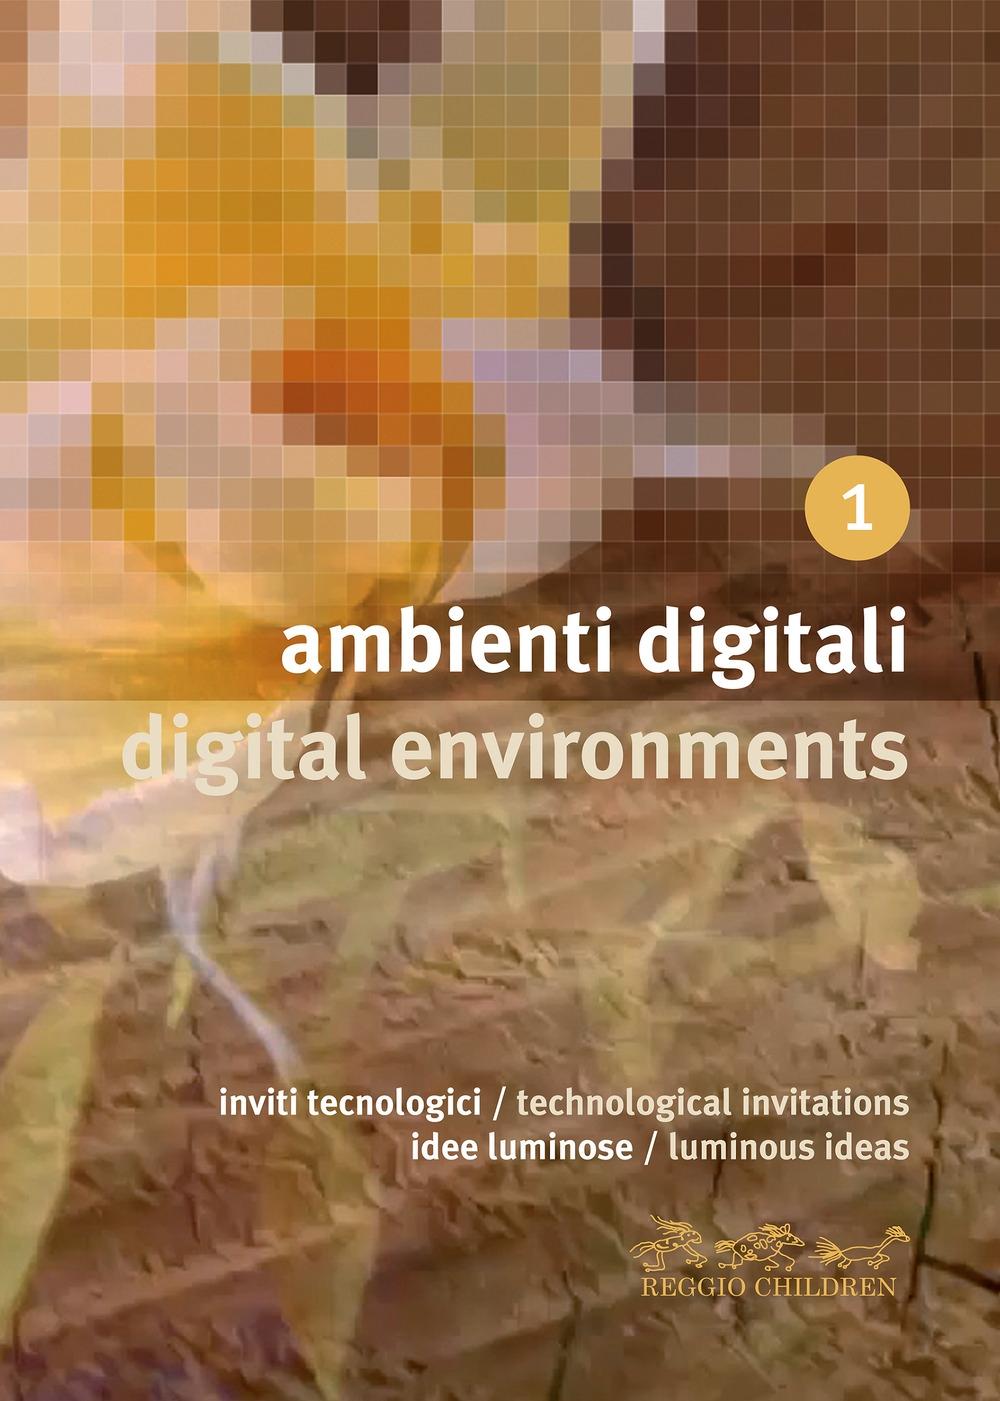 Ambienti digitali. Inviti tecnologici, idee luminose-Digital environments. Technological invitations, luminous ideas